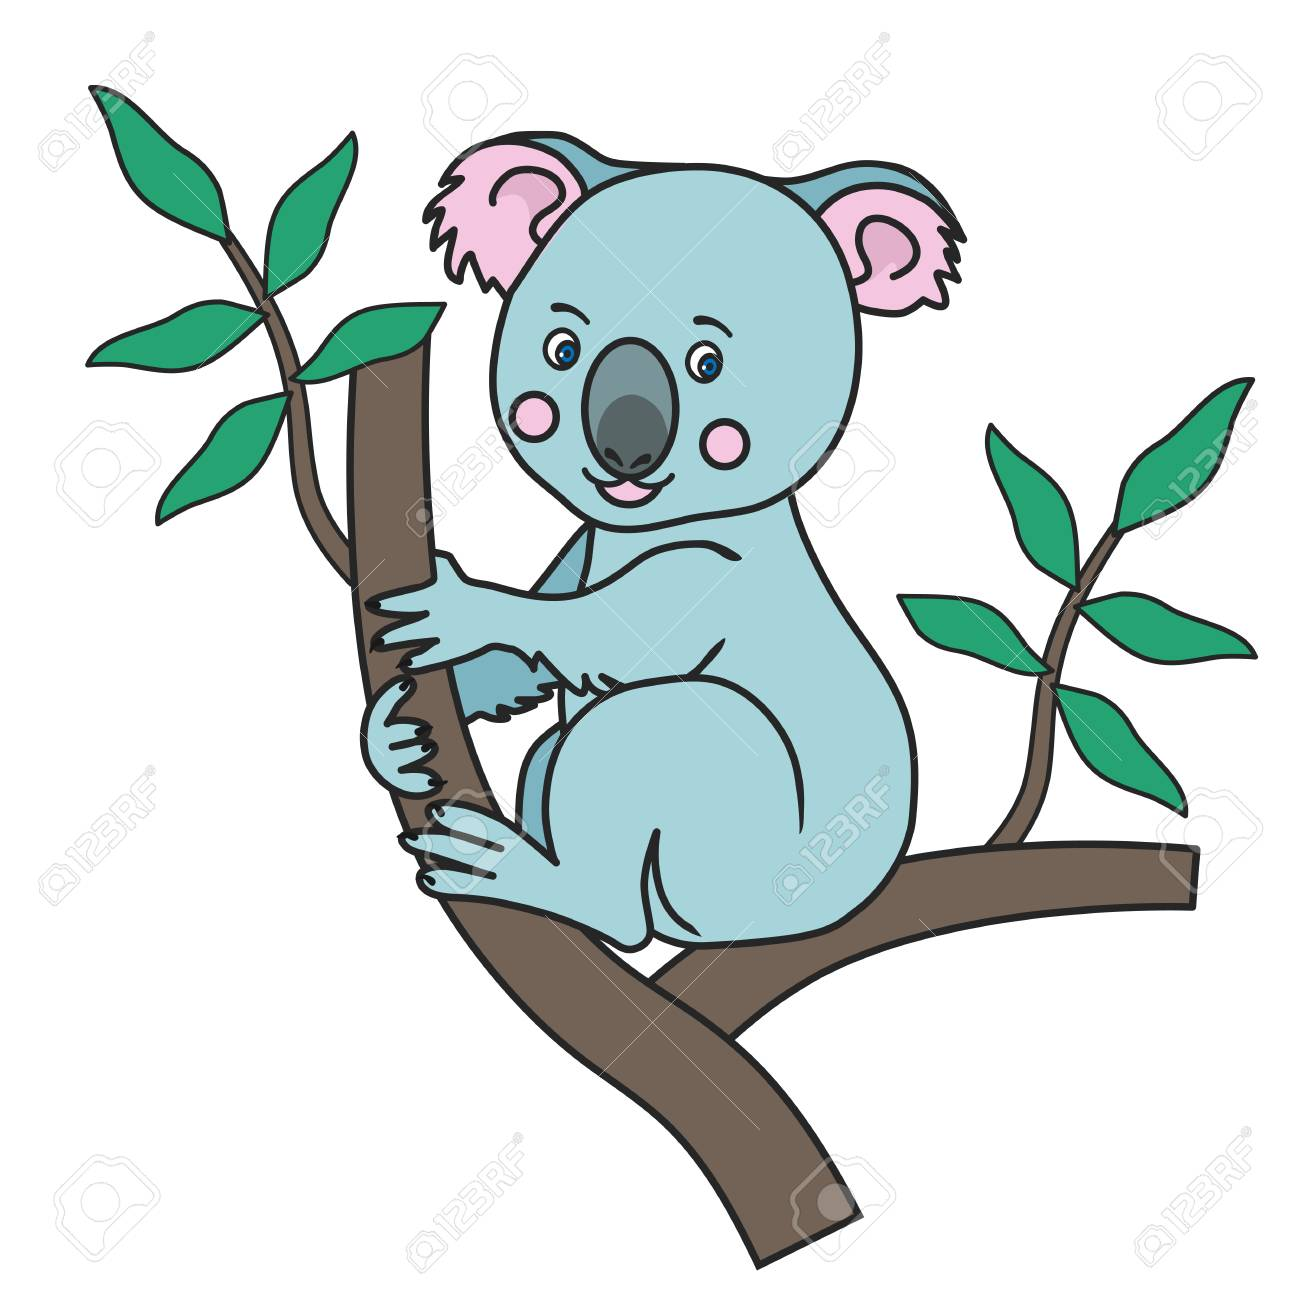 Cute Koala Print Royalty Free Cliparts Vectors And Stock